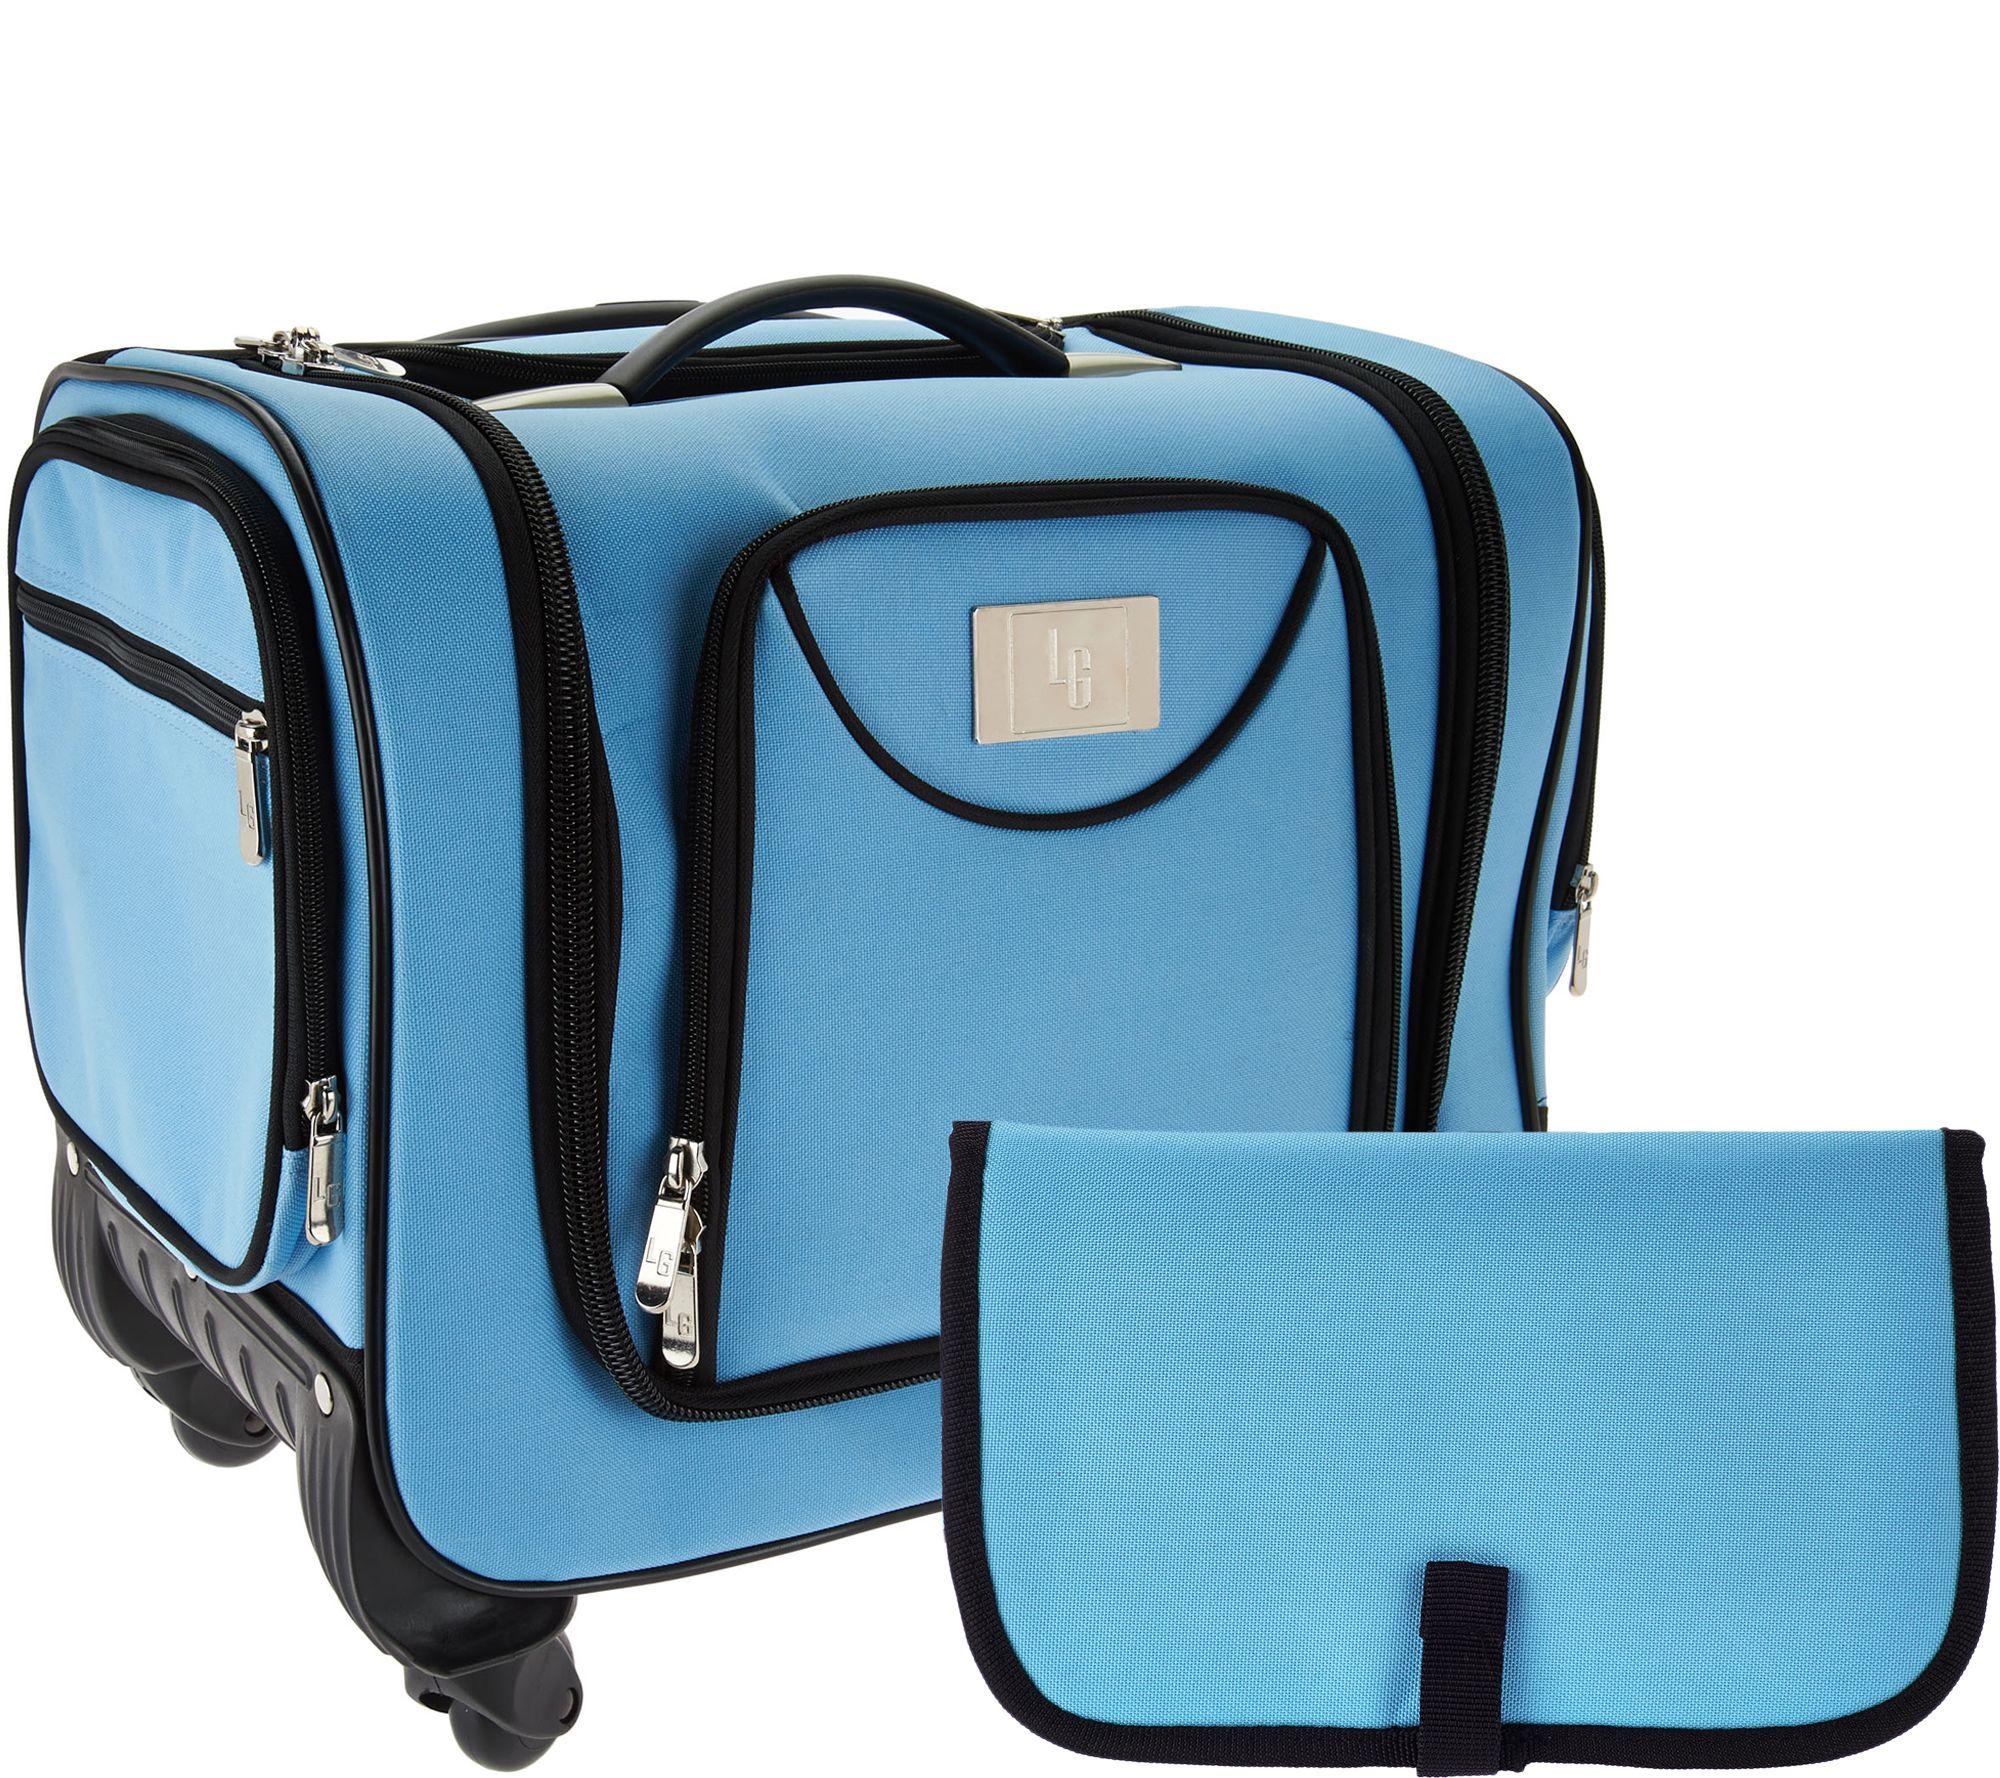 Weekender Bag with Snap In Toiletry Case by Lori Greiner Page 1